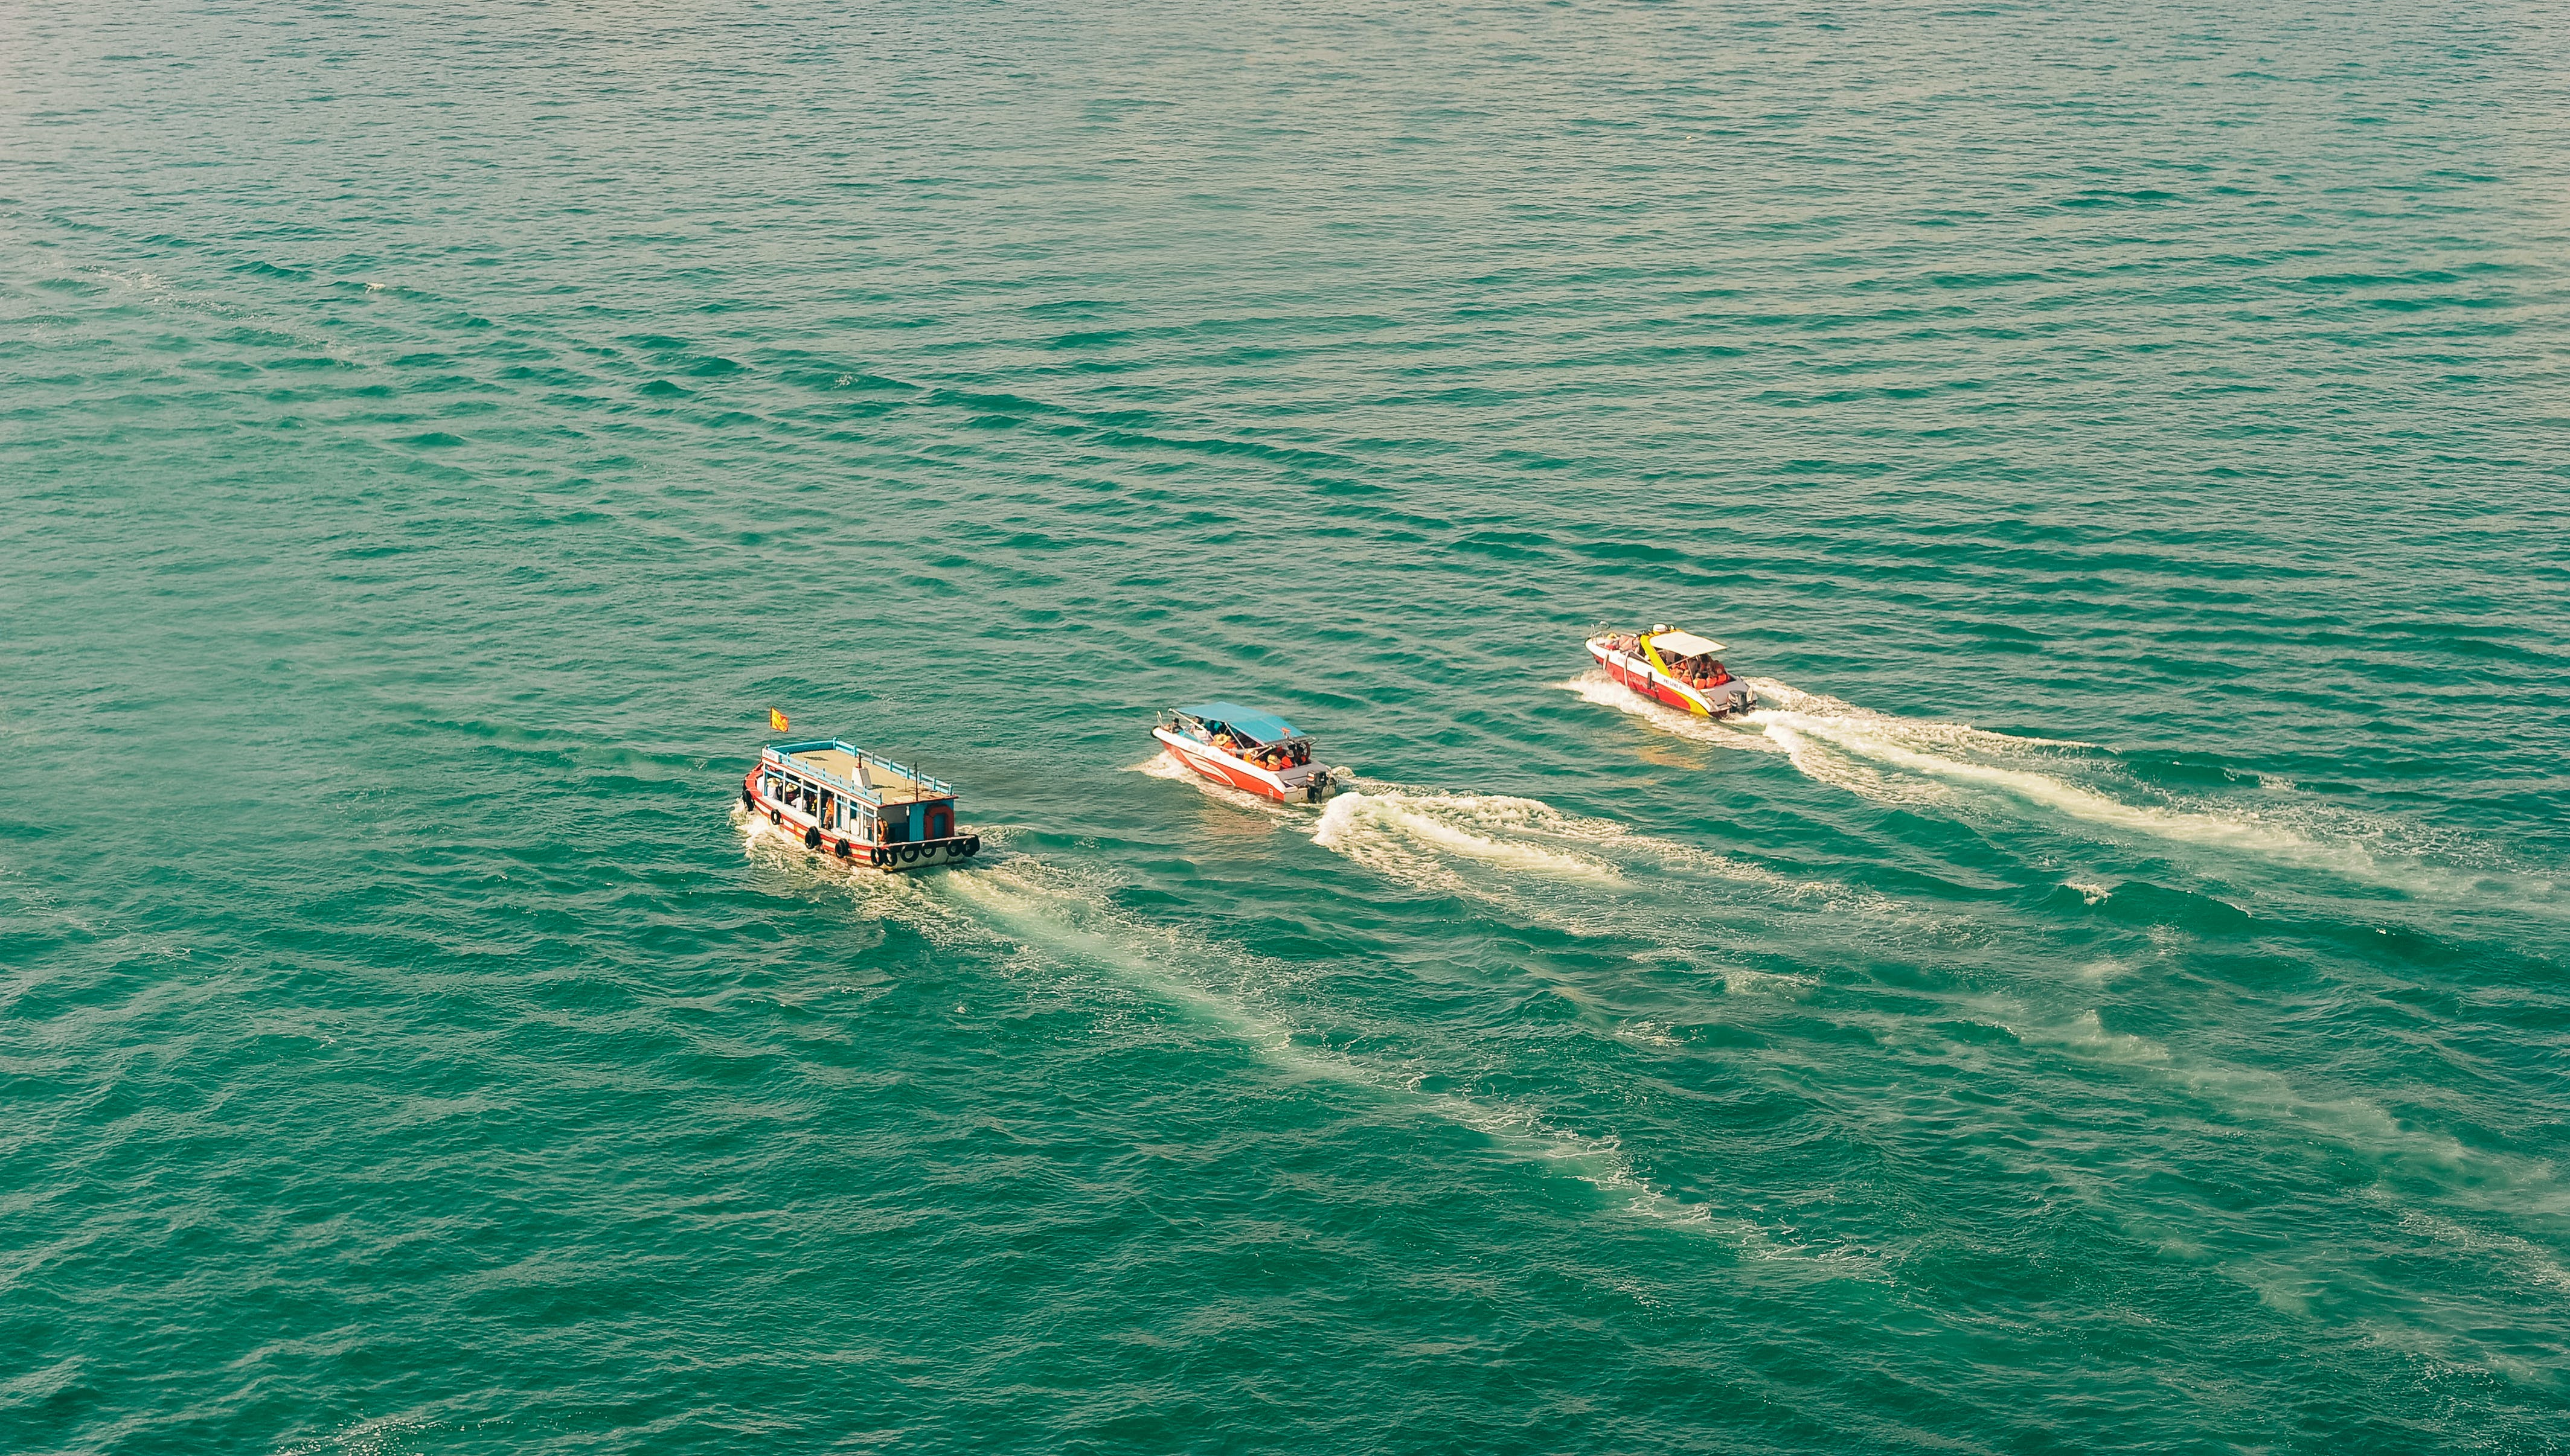 Three Speedboats Aerial Photography